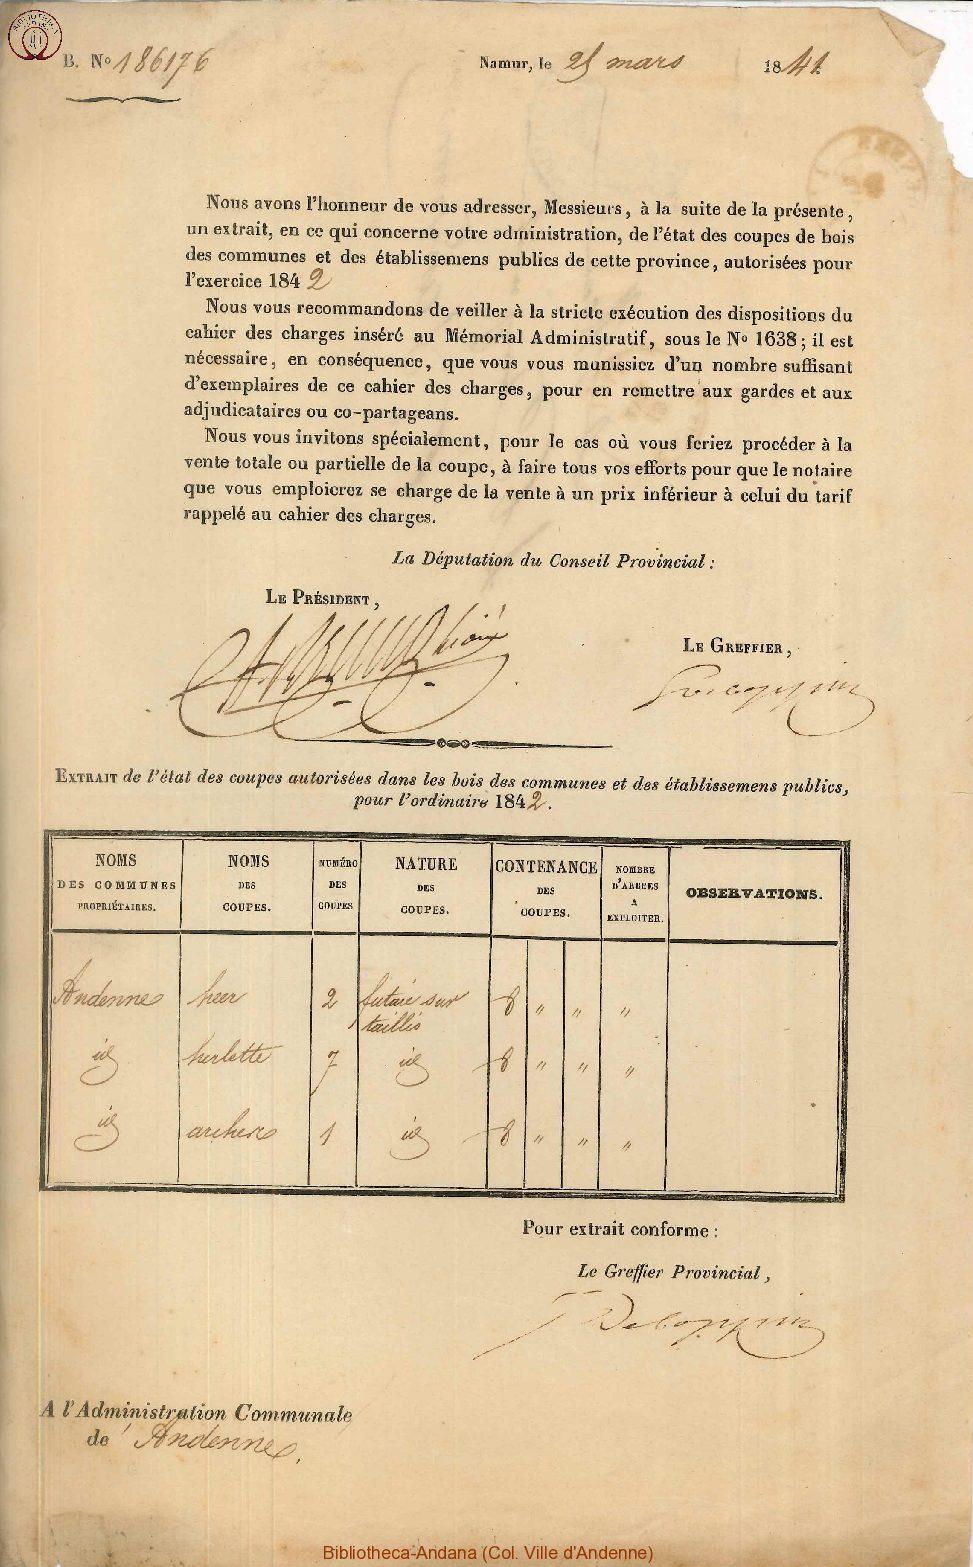 1841-03-25